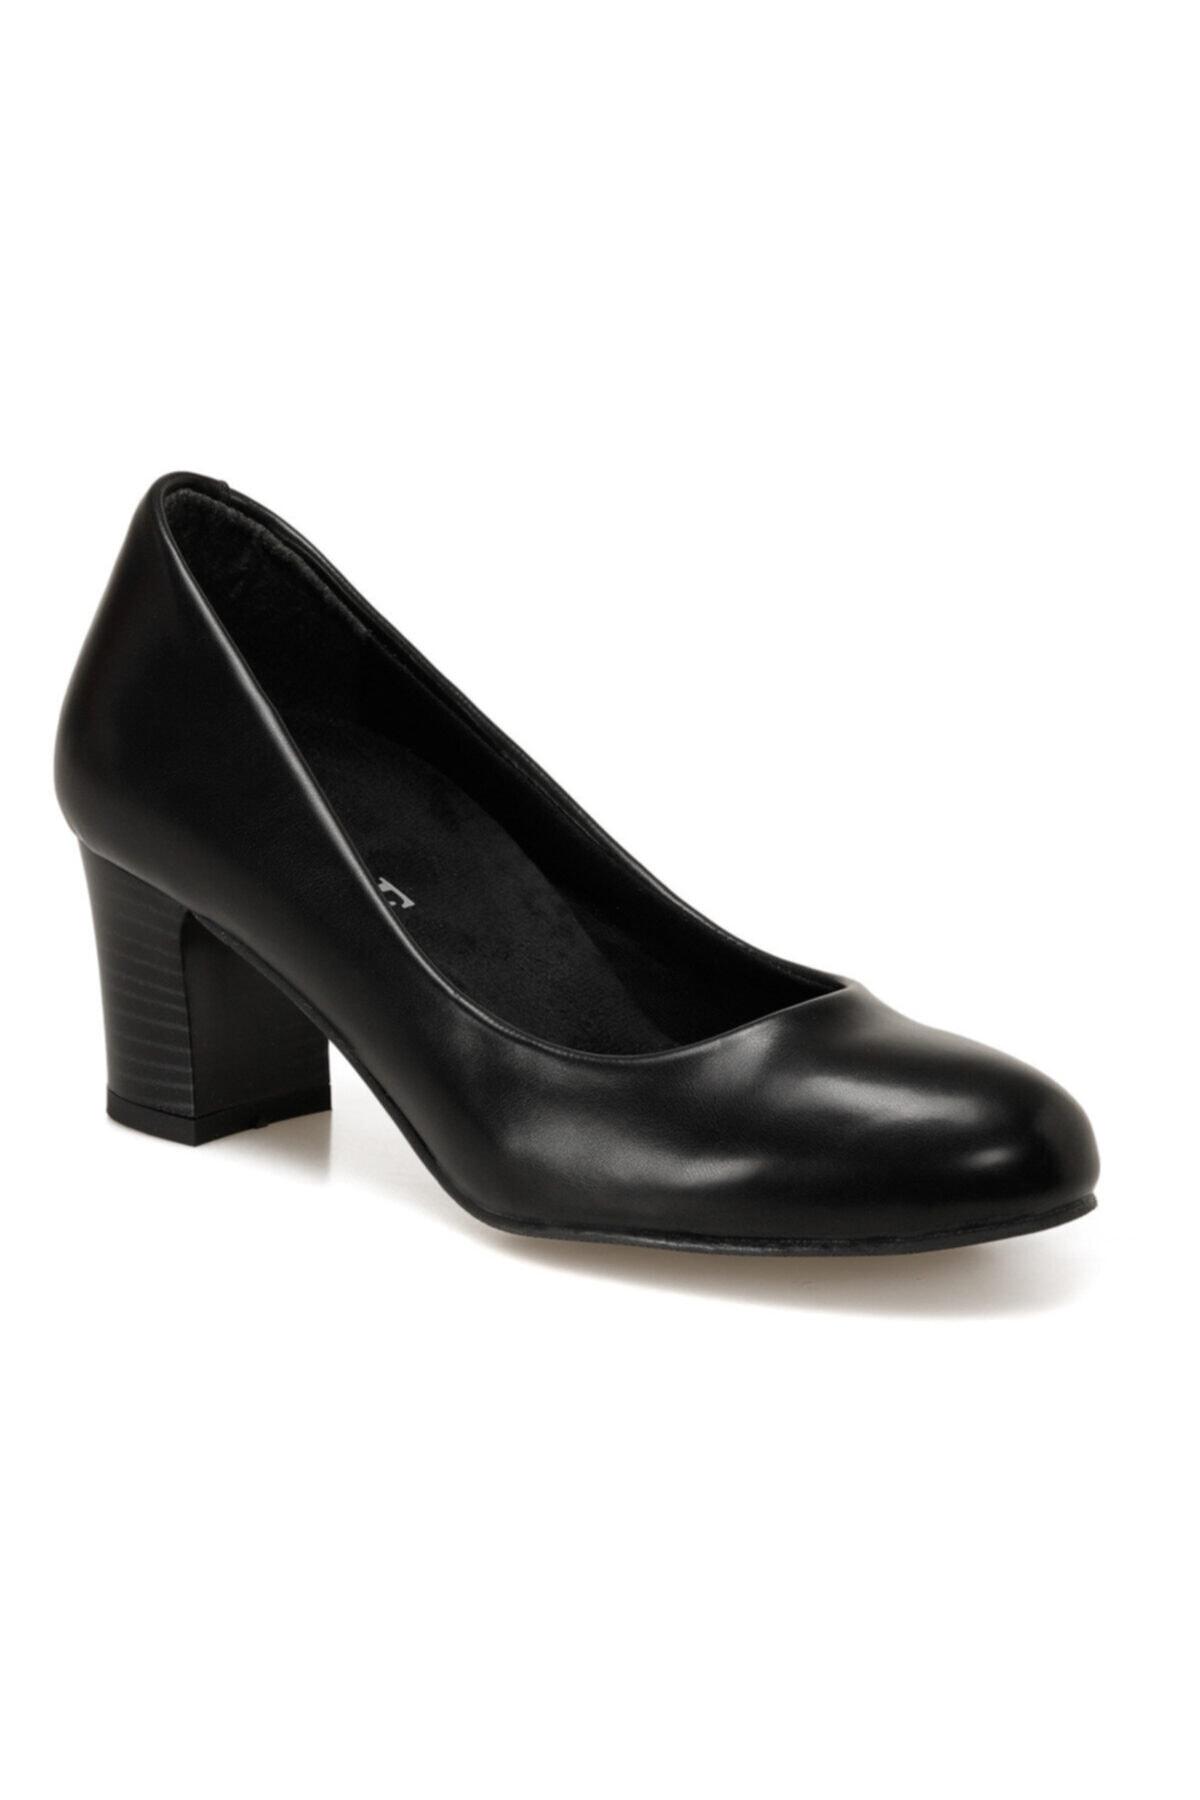 Miss F DW20028 Siyah Kadın Topuklu Ayakkabı 100572125 1